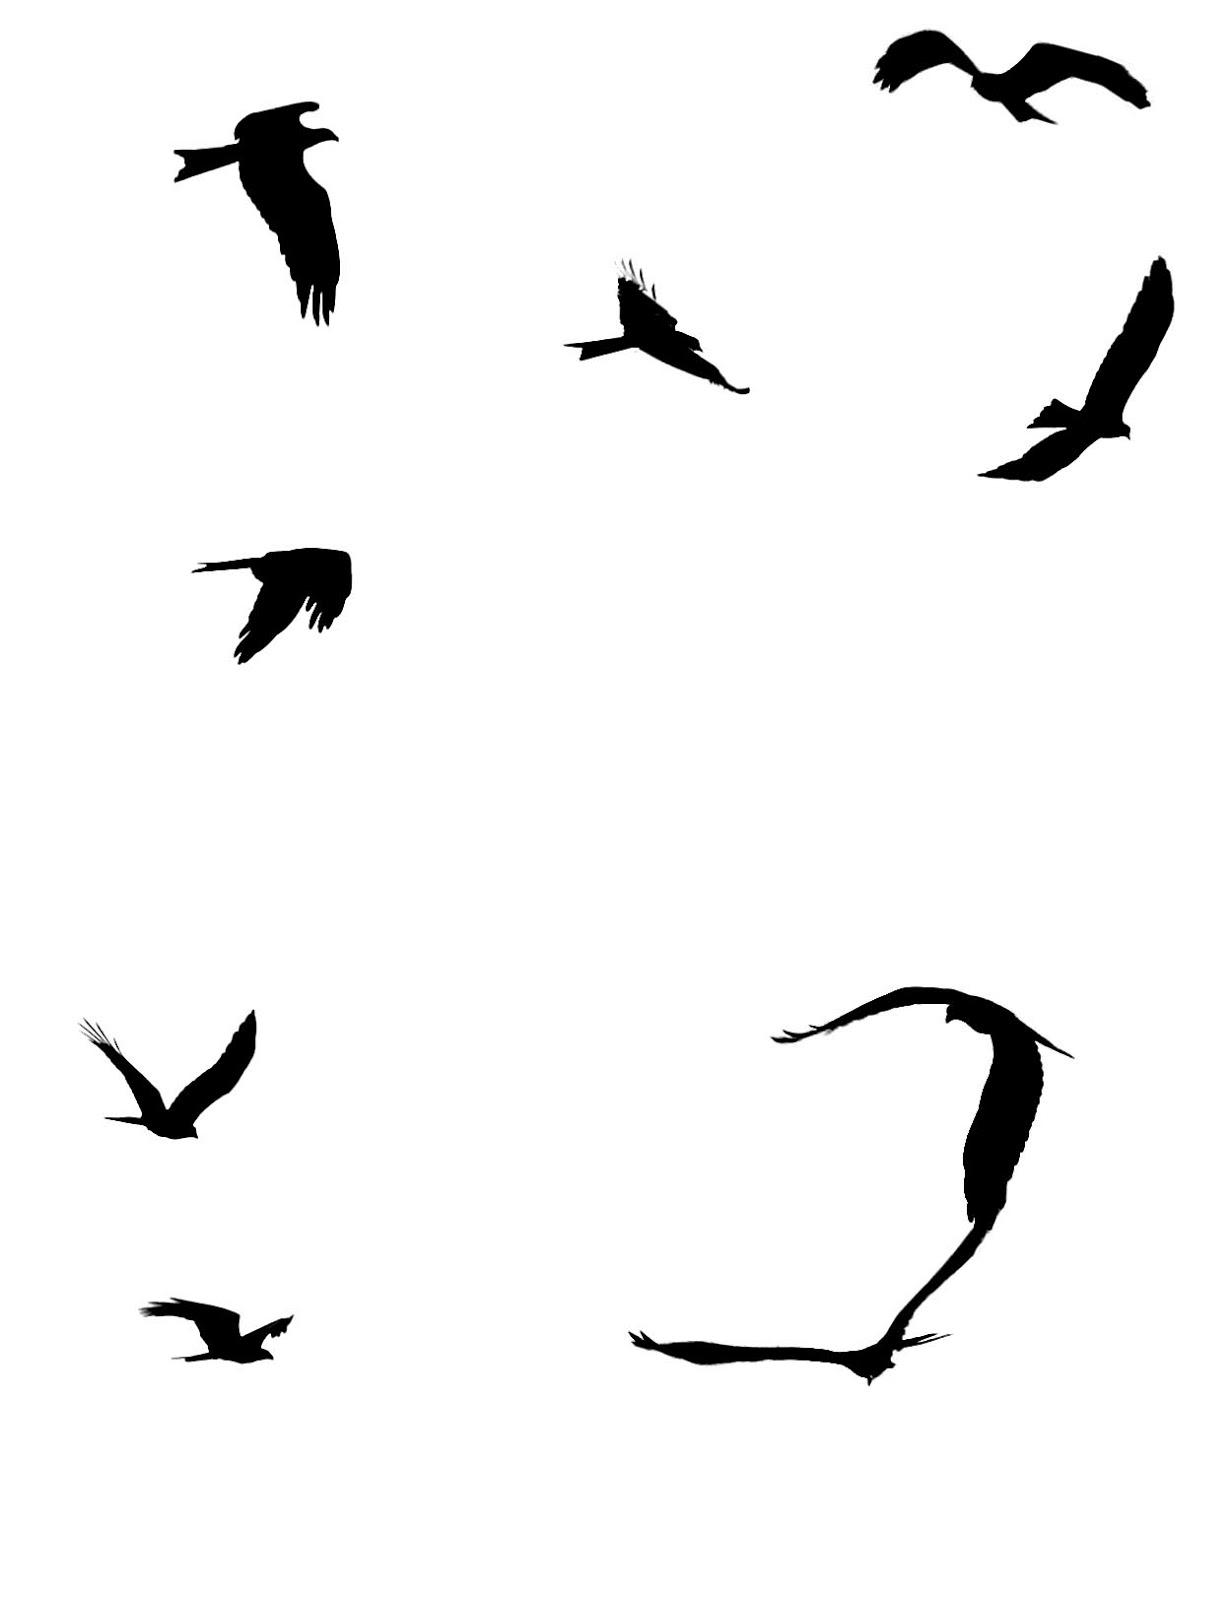 Bird in flight silhouette - photo#10